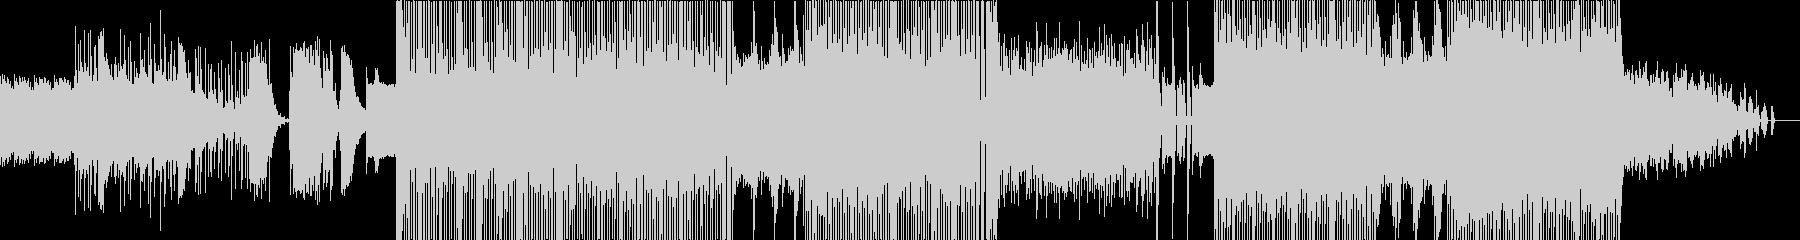 EL SANTOの未再生の波形